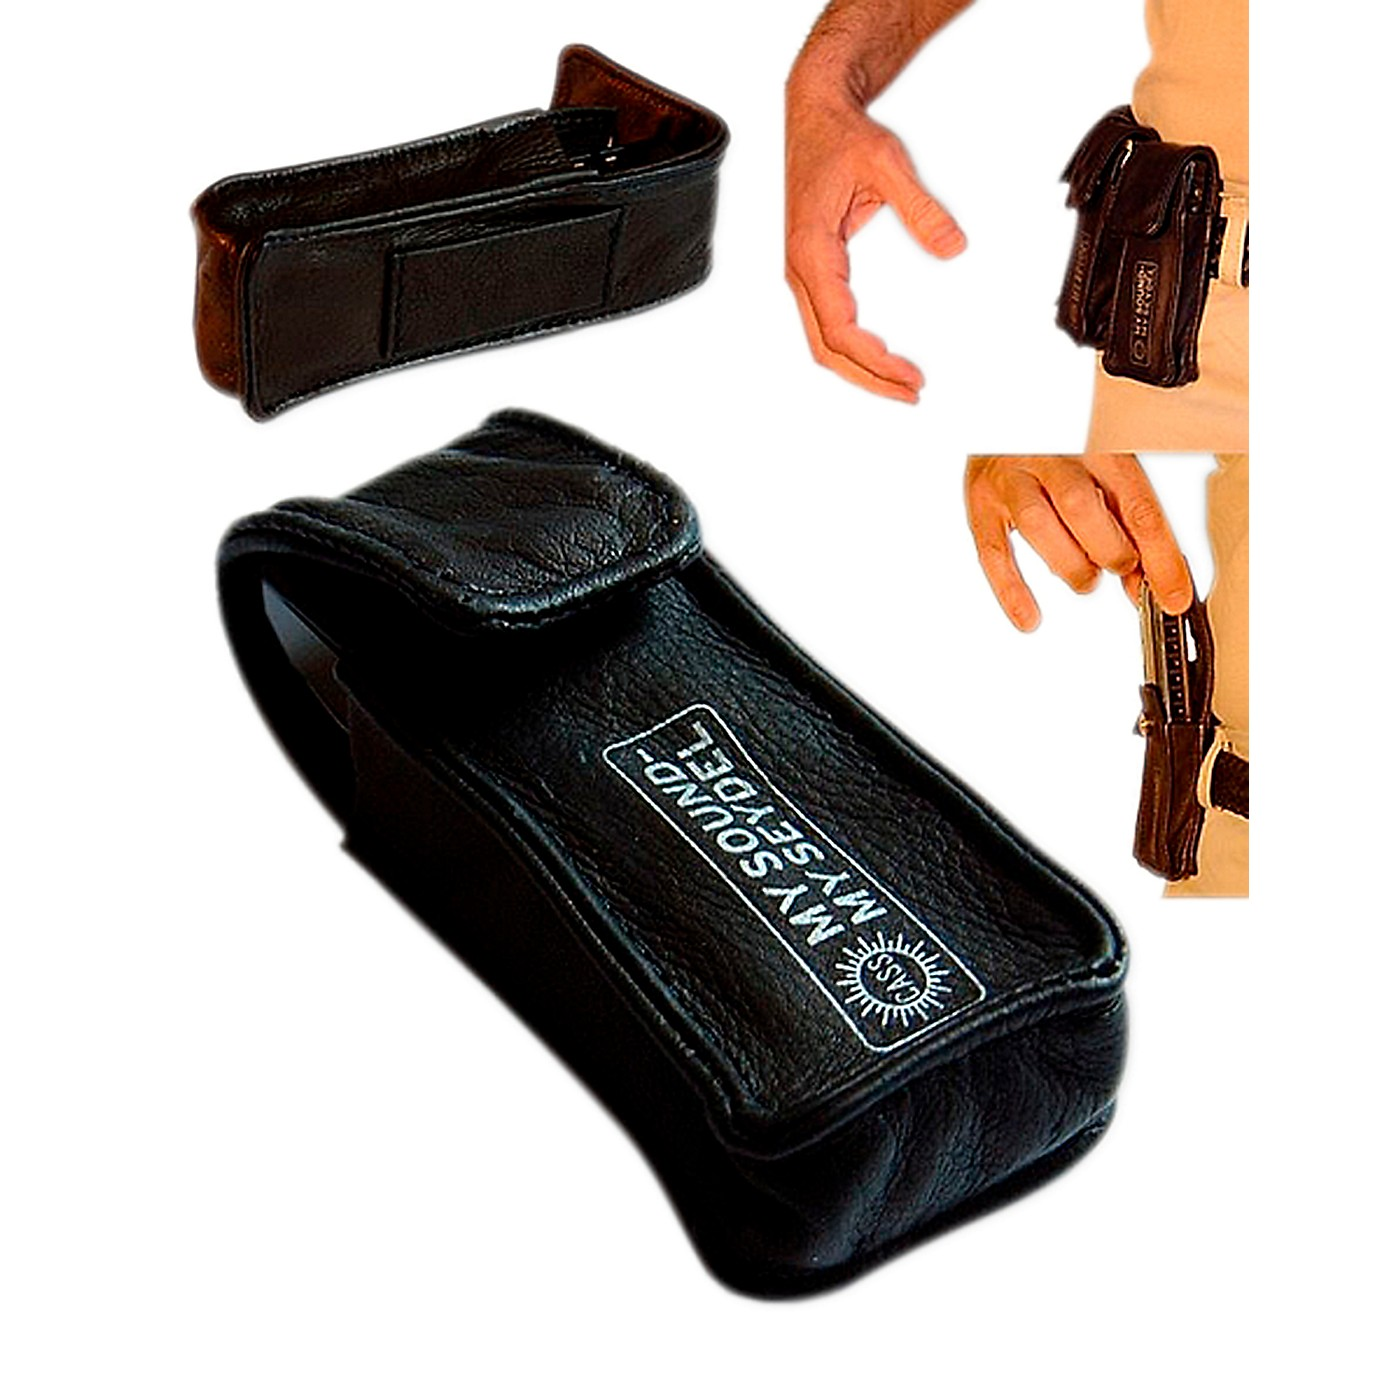 SEYDEL Leather BELT BAG for 1 Blues Harmonica thumbnail